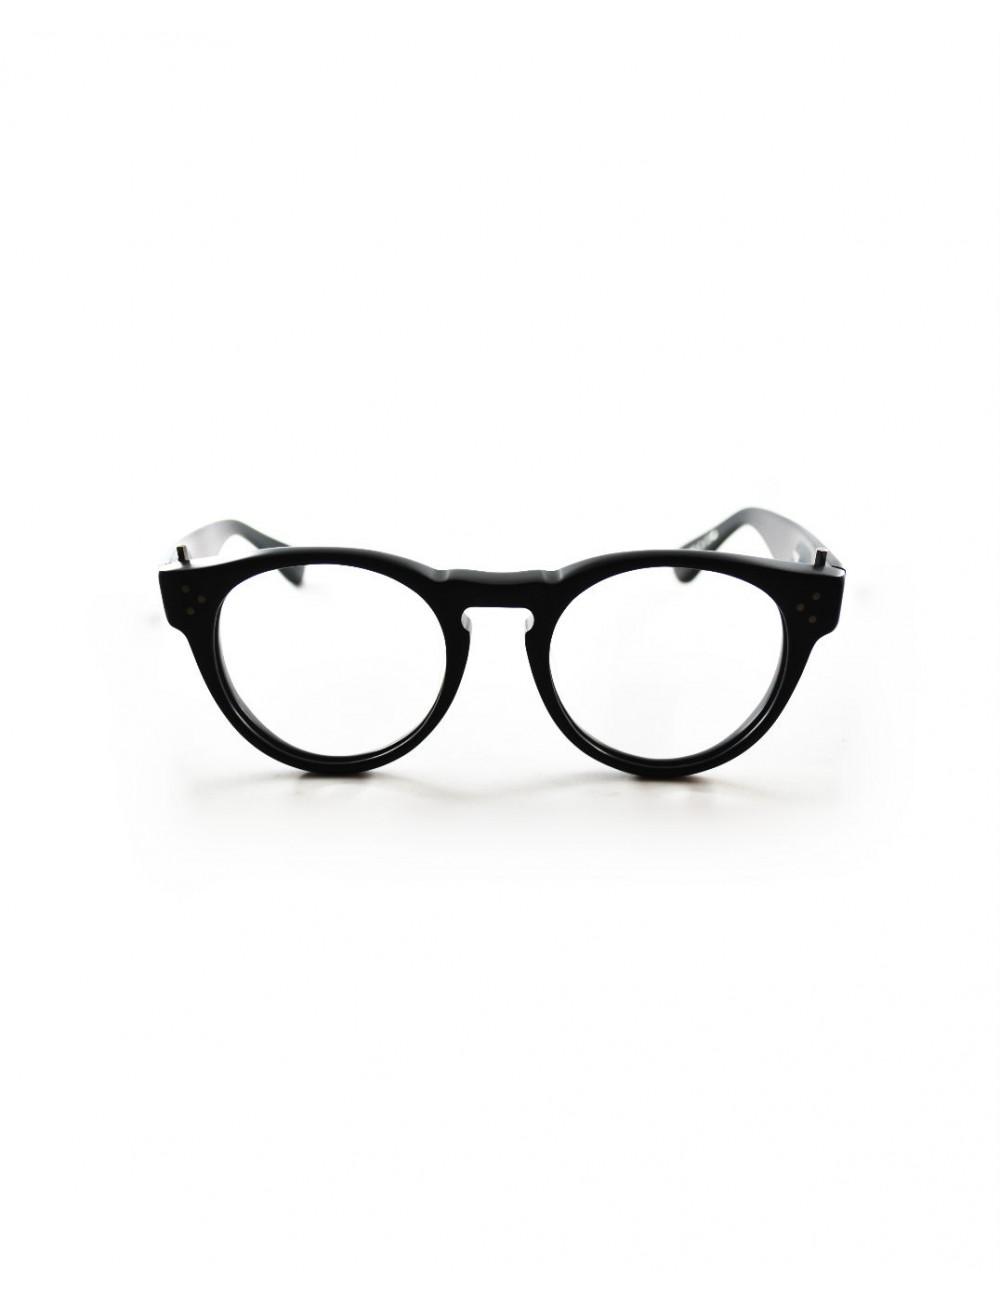 Pine Pine 1002 1 blk  EyewearShop Online